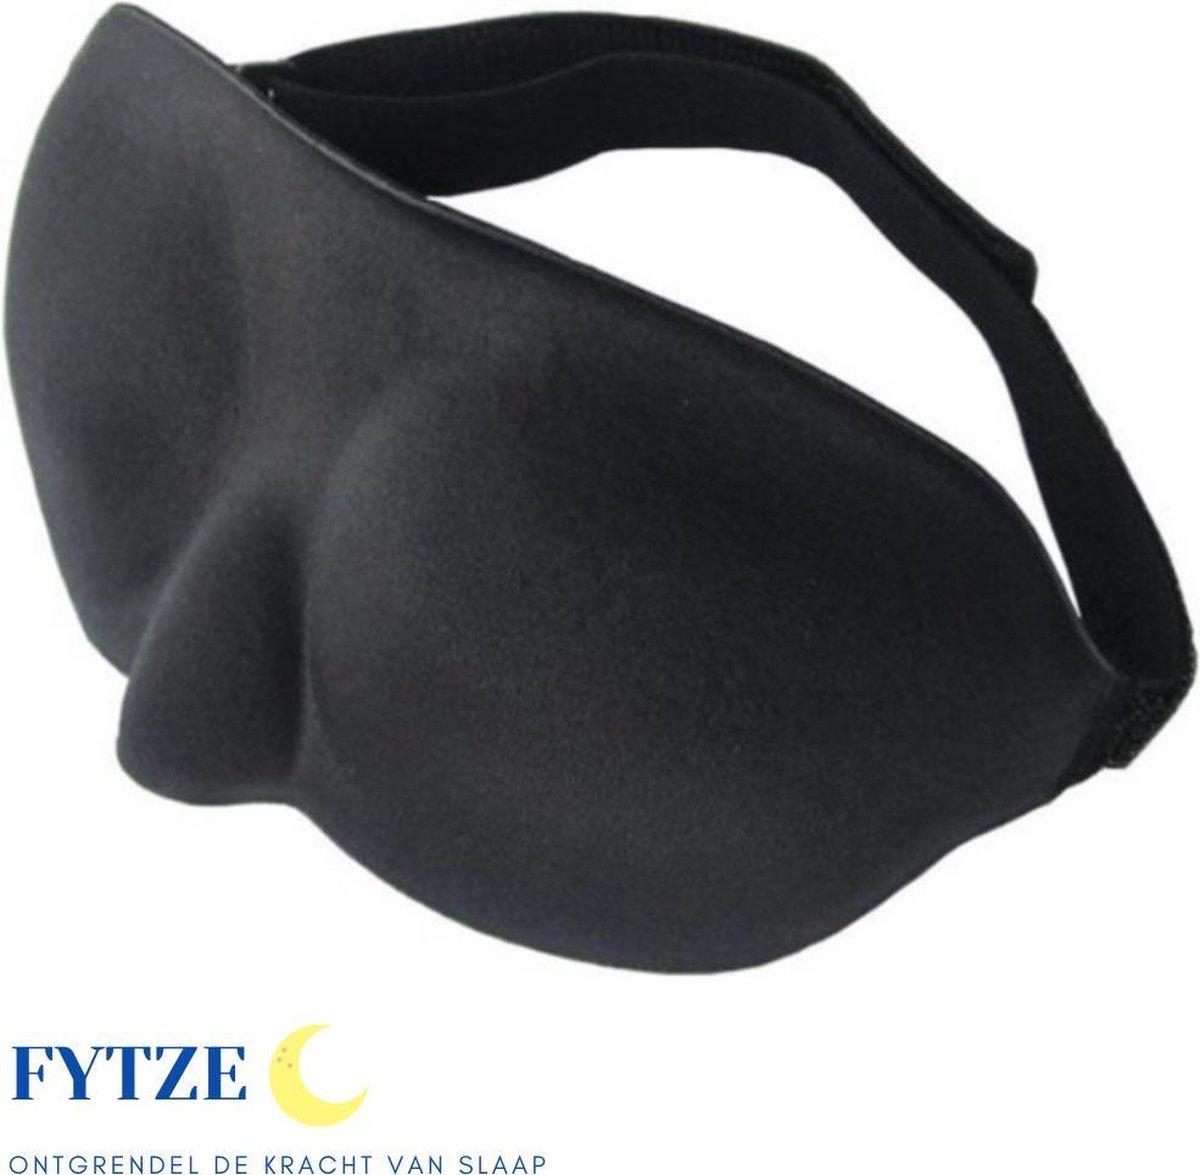 FYTZE - 3D Slaapmasker / Oogmasker beter slapen ! Slaapmasker Mannen Vrouwen Sleeping Mask Sleep Mas